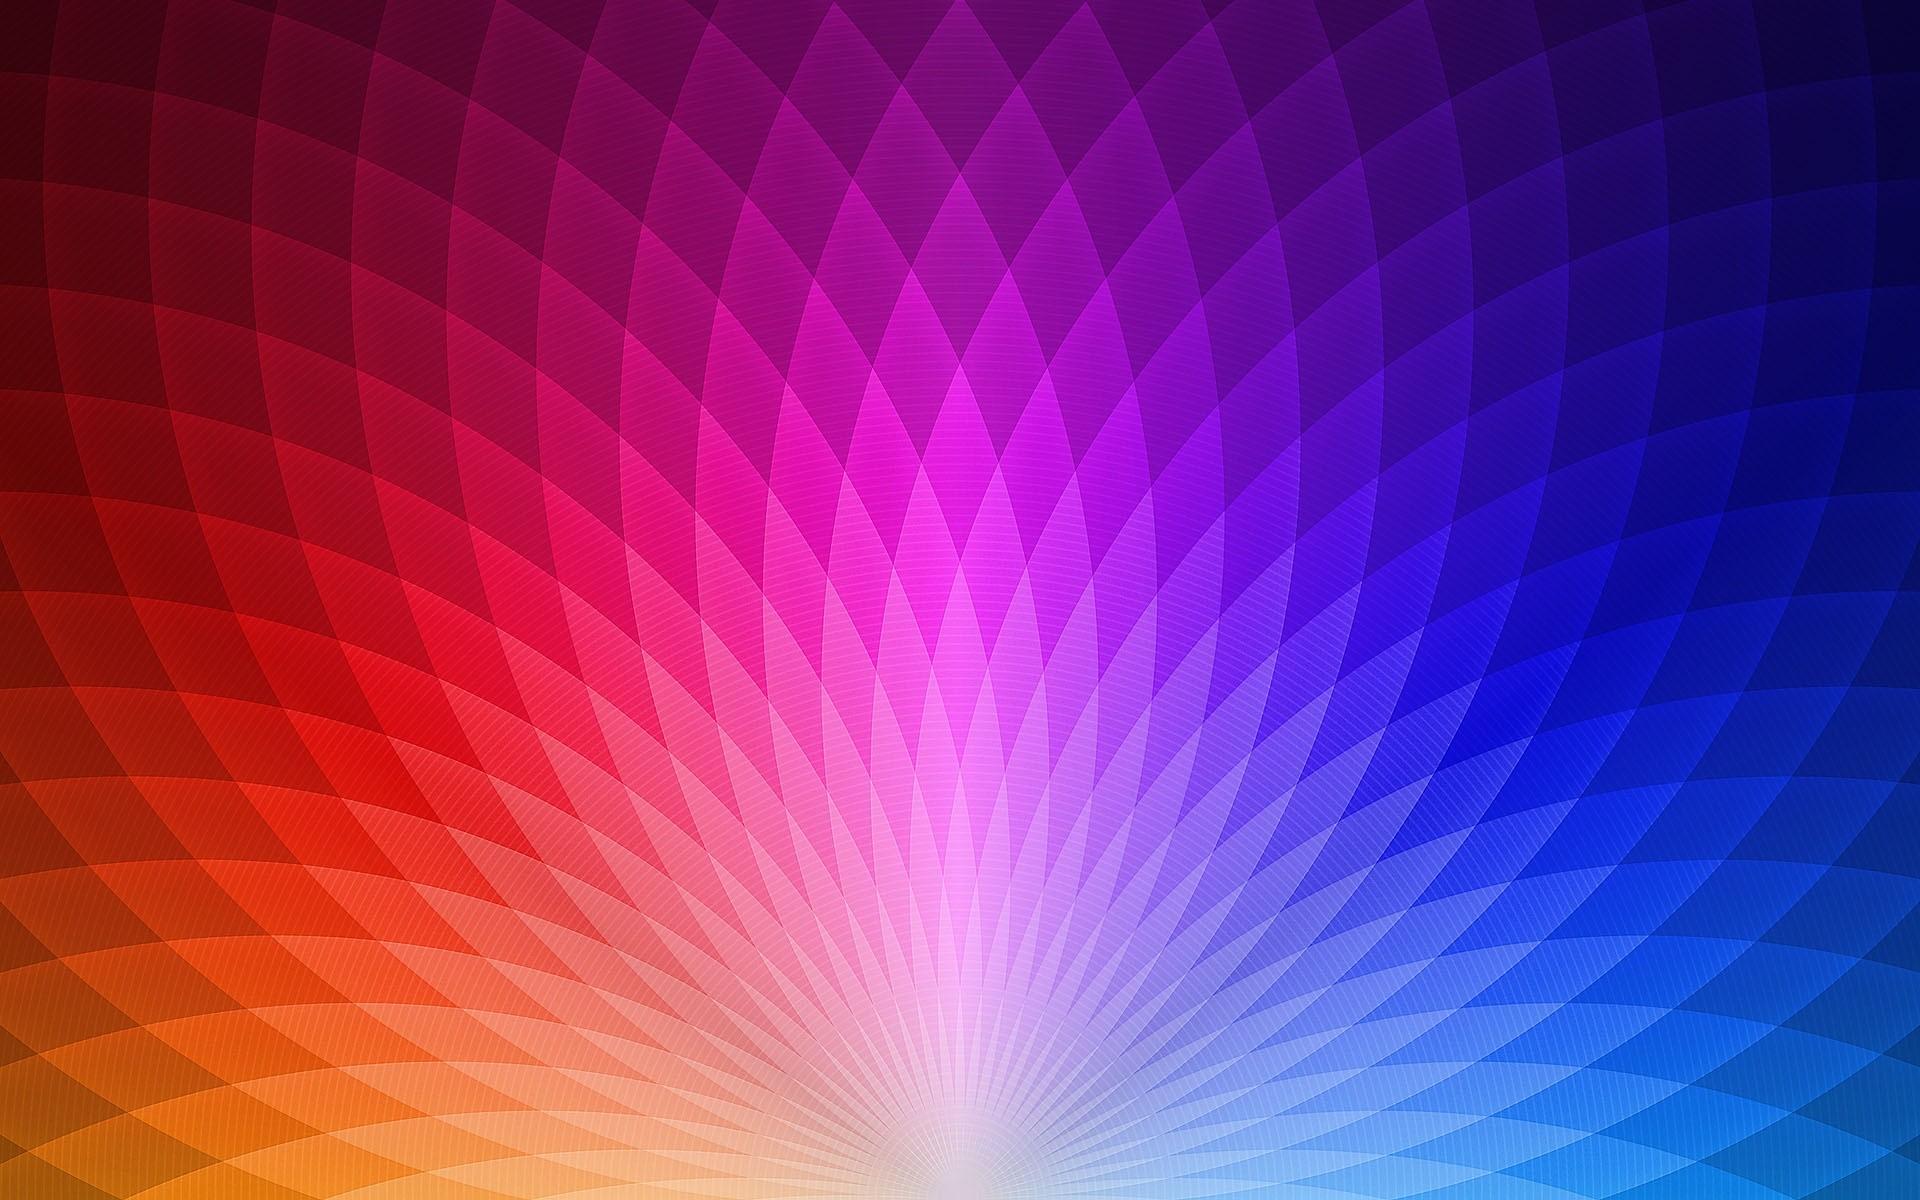 Download Wallpaper Form, Light, Figure HD Background |  Desktop Backgrounds | Pinterest | Hd backgrounds, Mac laptop and Wallpaper